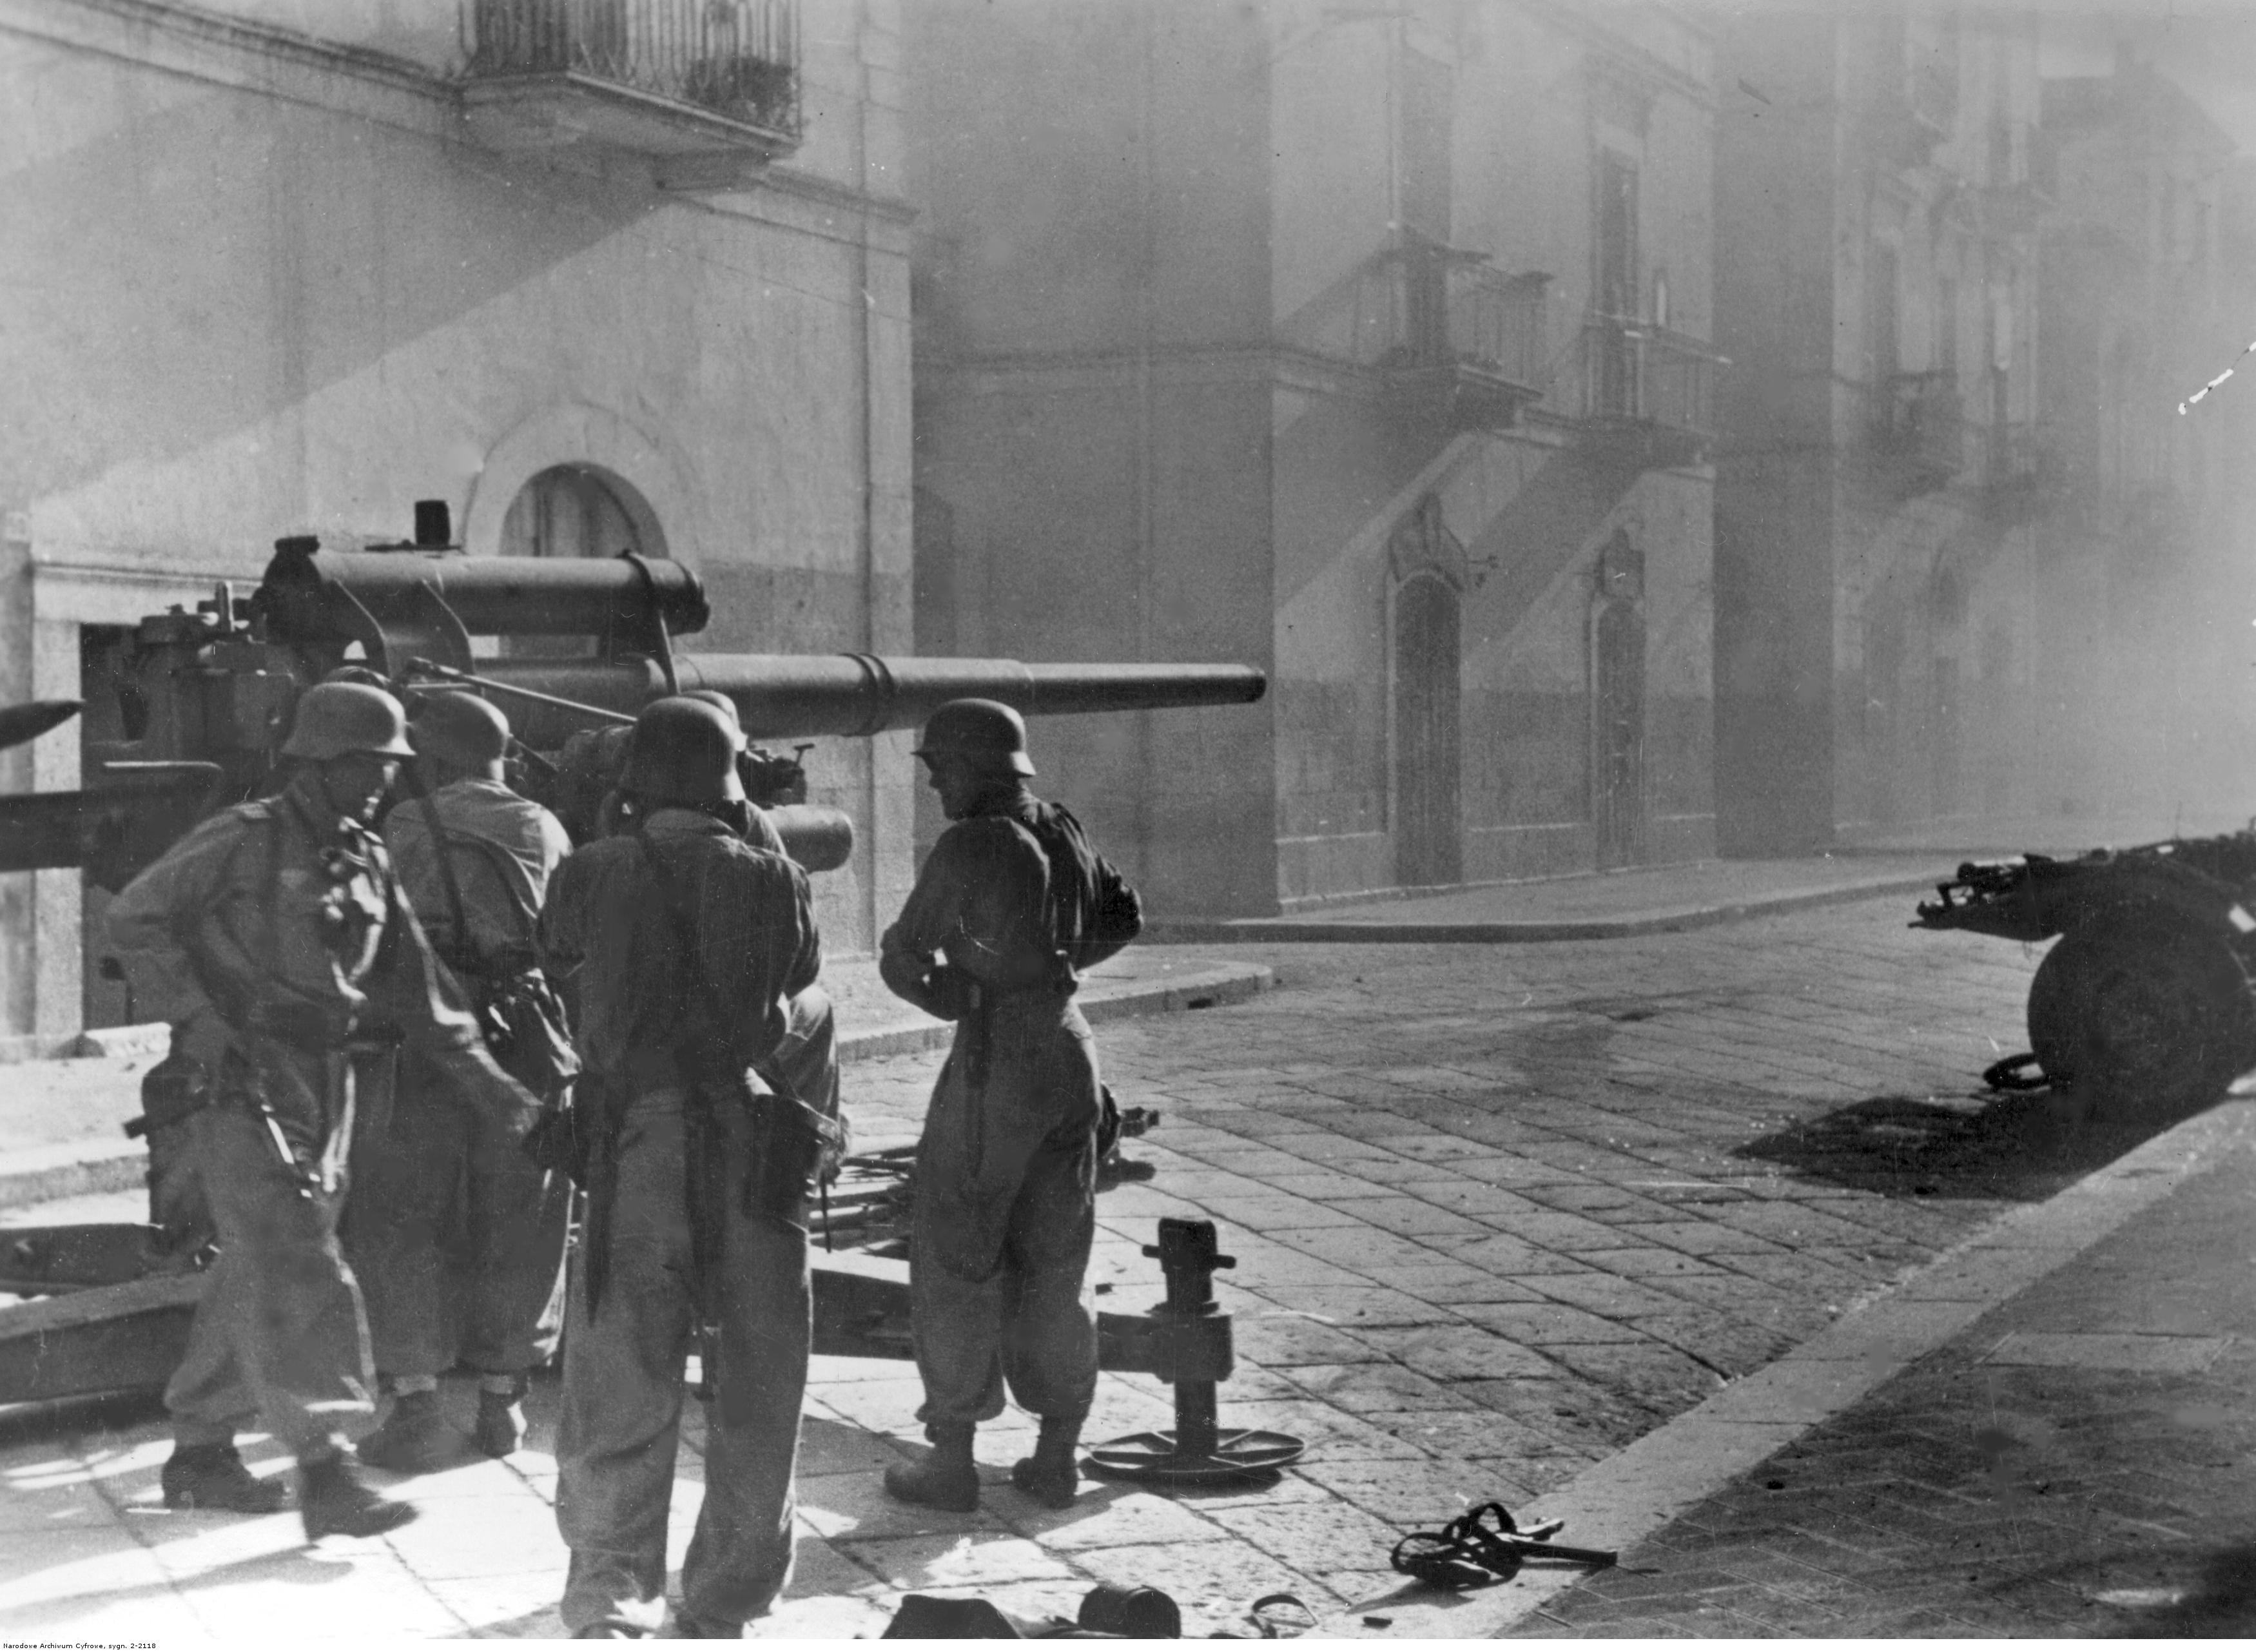 People 3500x2563 World War II artillery Wermacht military German Empire monochrome